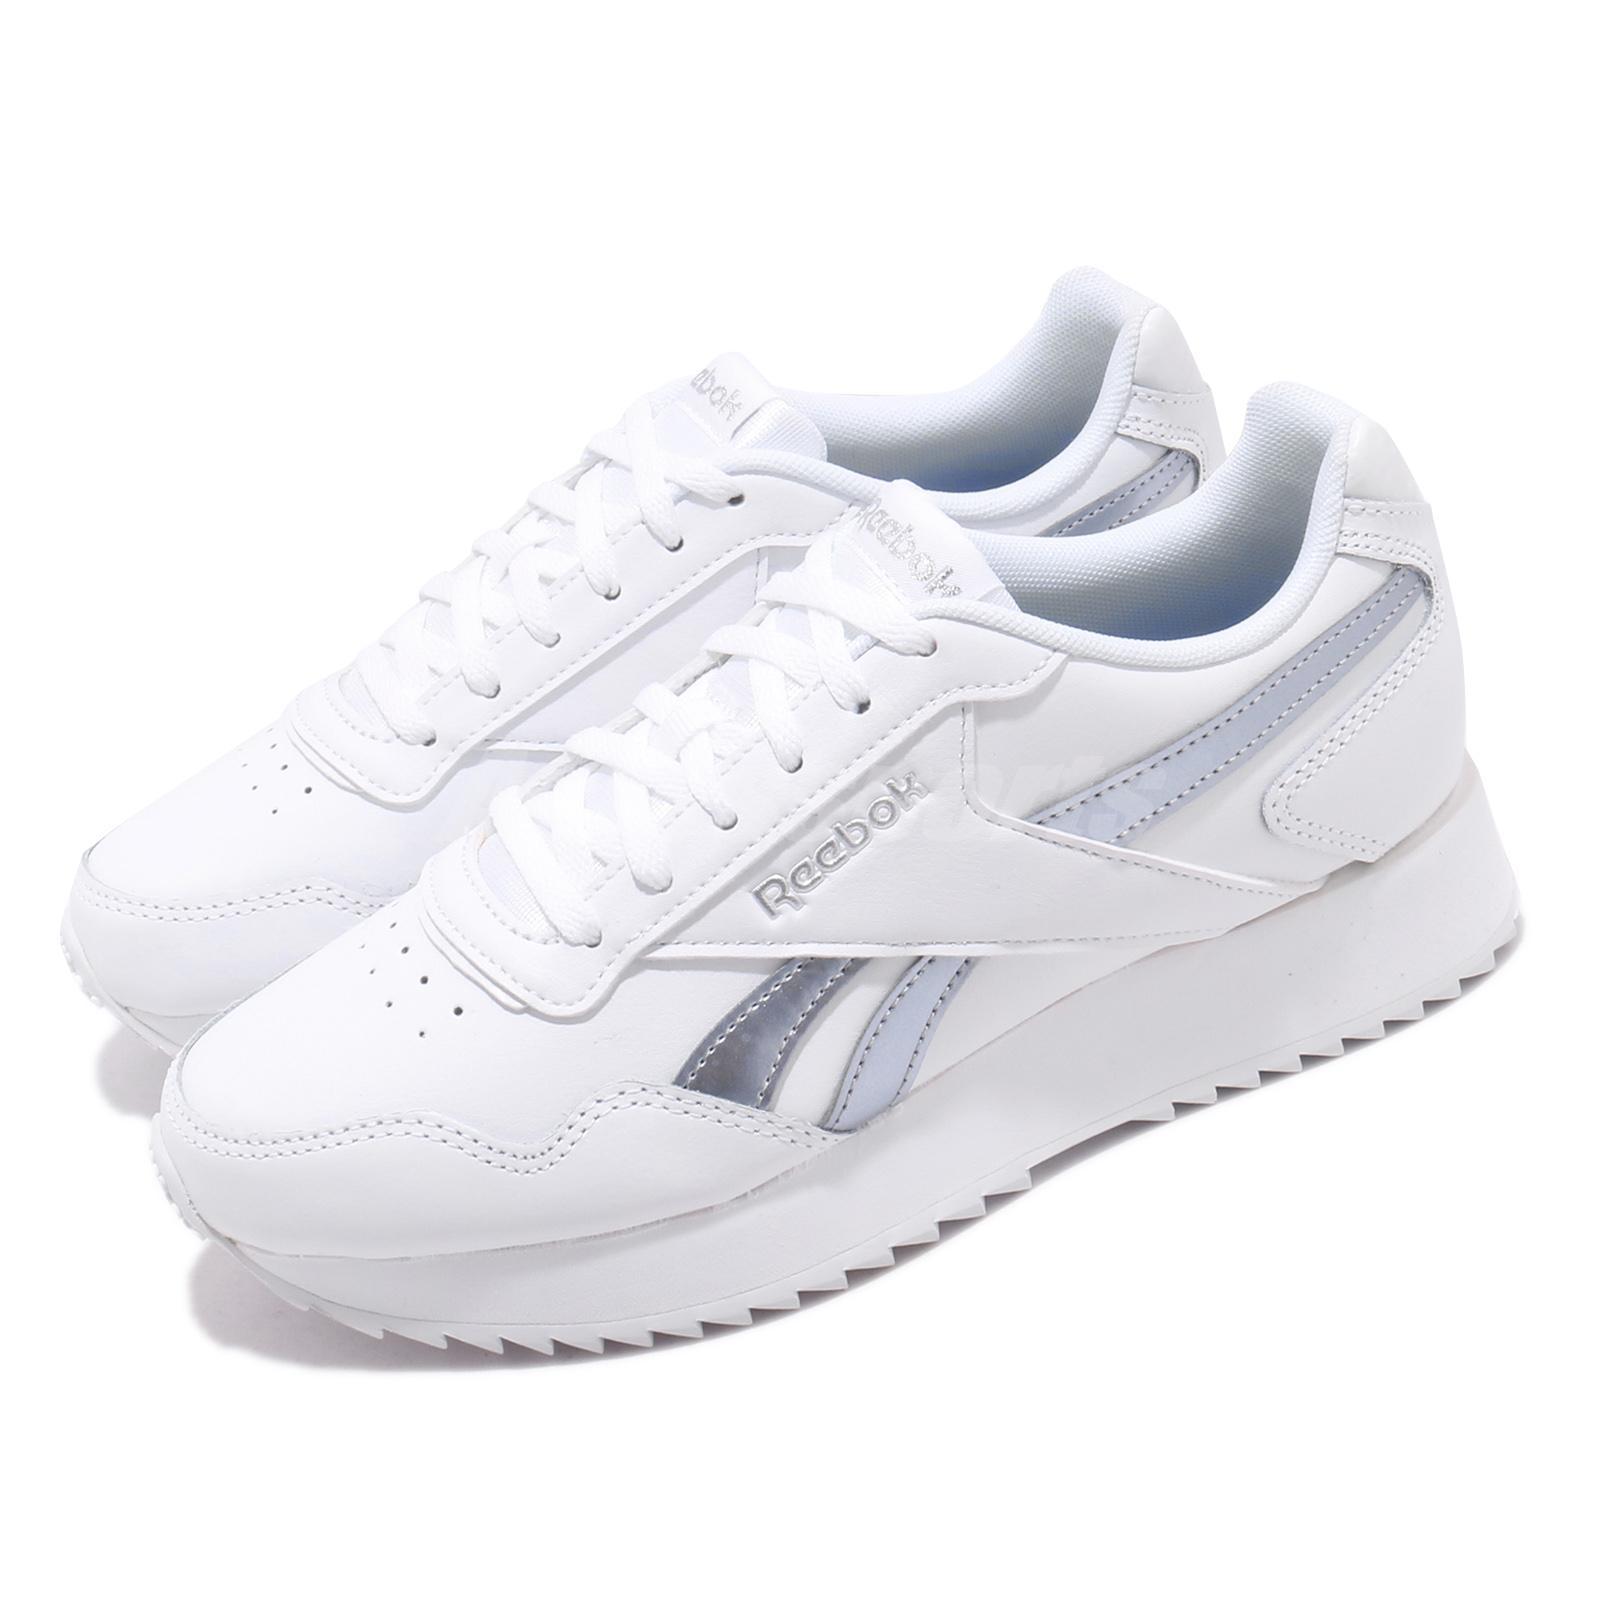 reebok platform shoes - 50% OFF